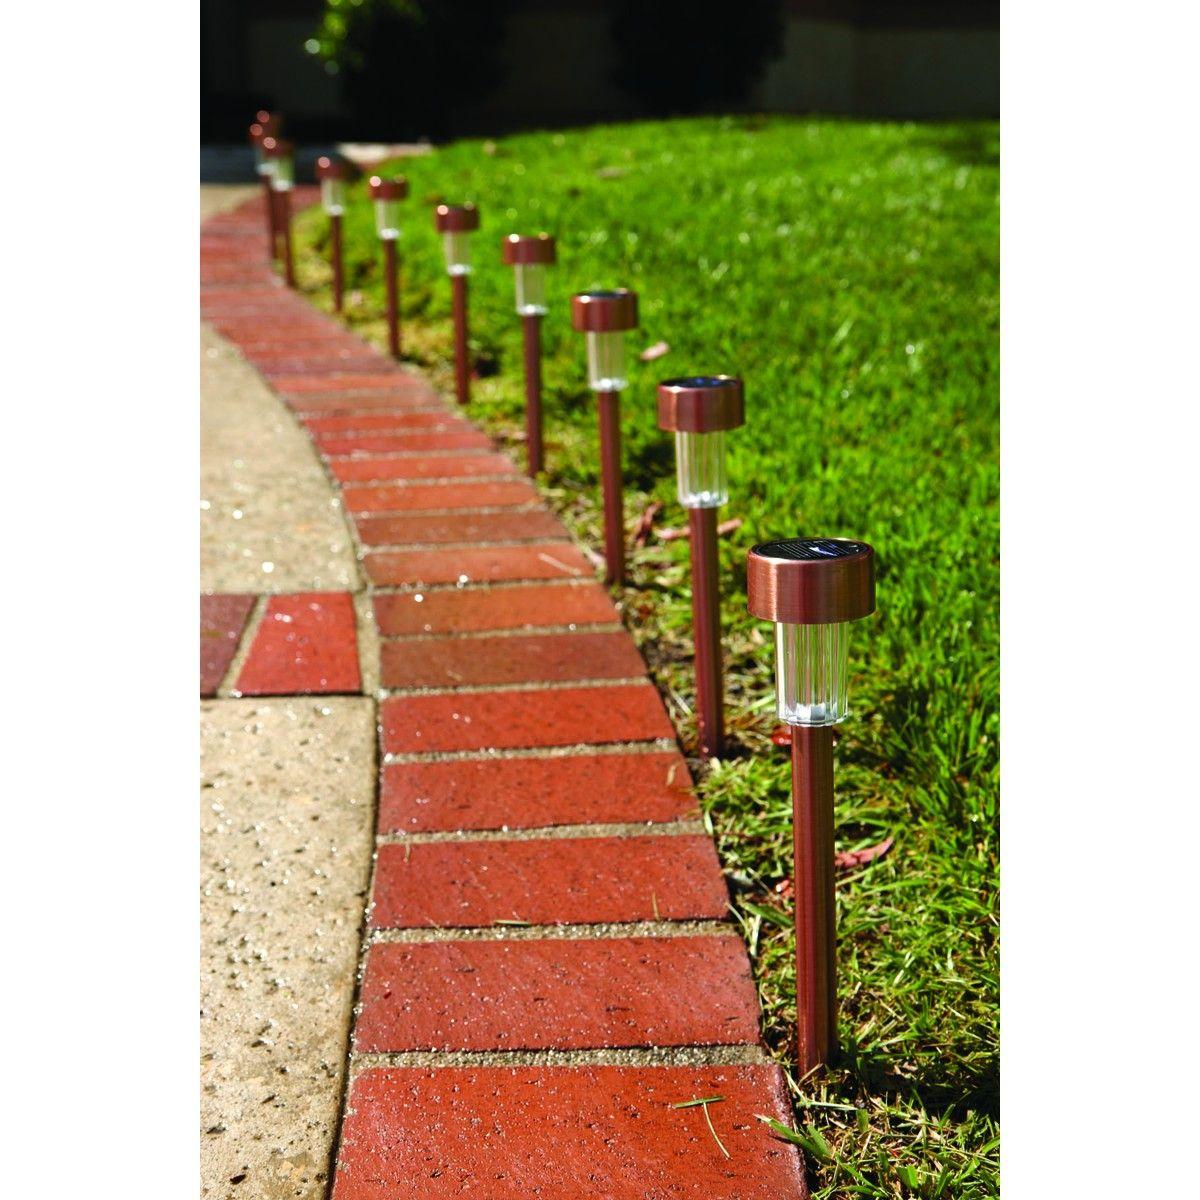 Solar Copper Led Path Lights 10 Piece Wish List Led Path Lights Path Lights Solar Pathway Lights